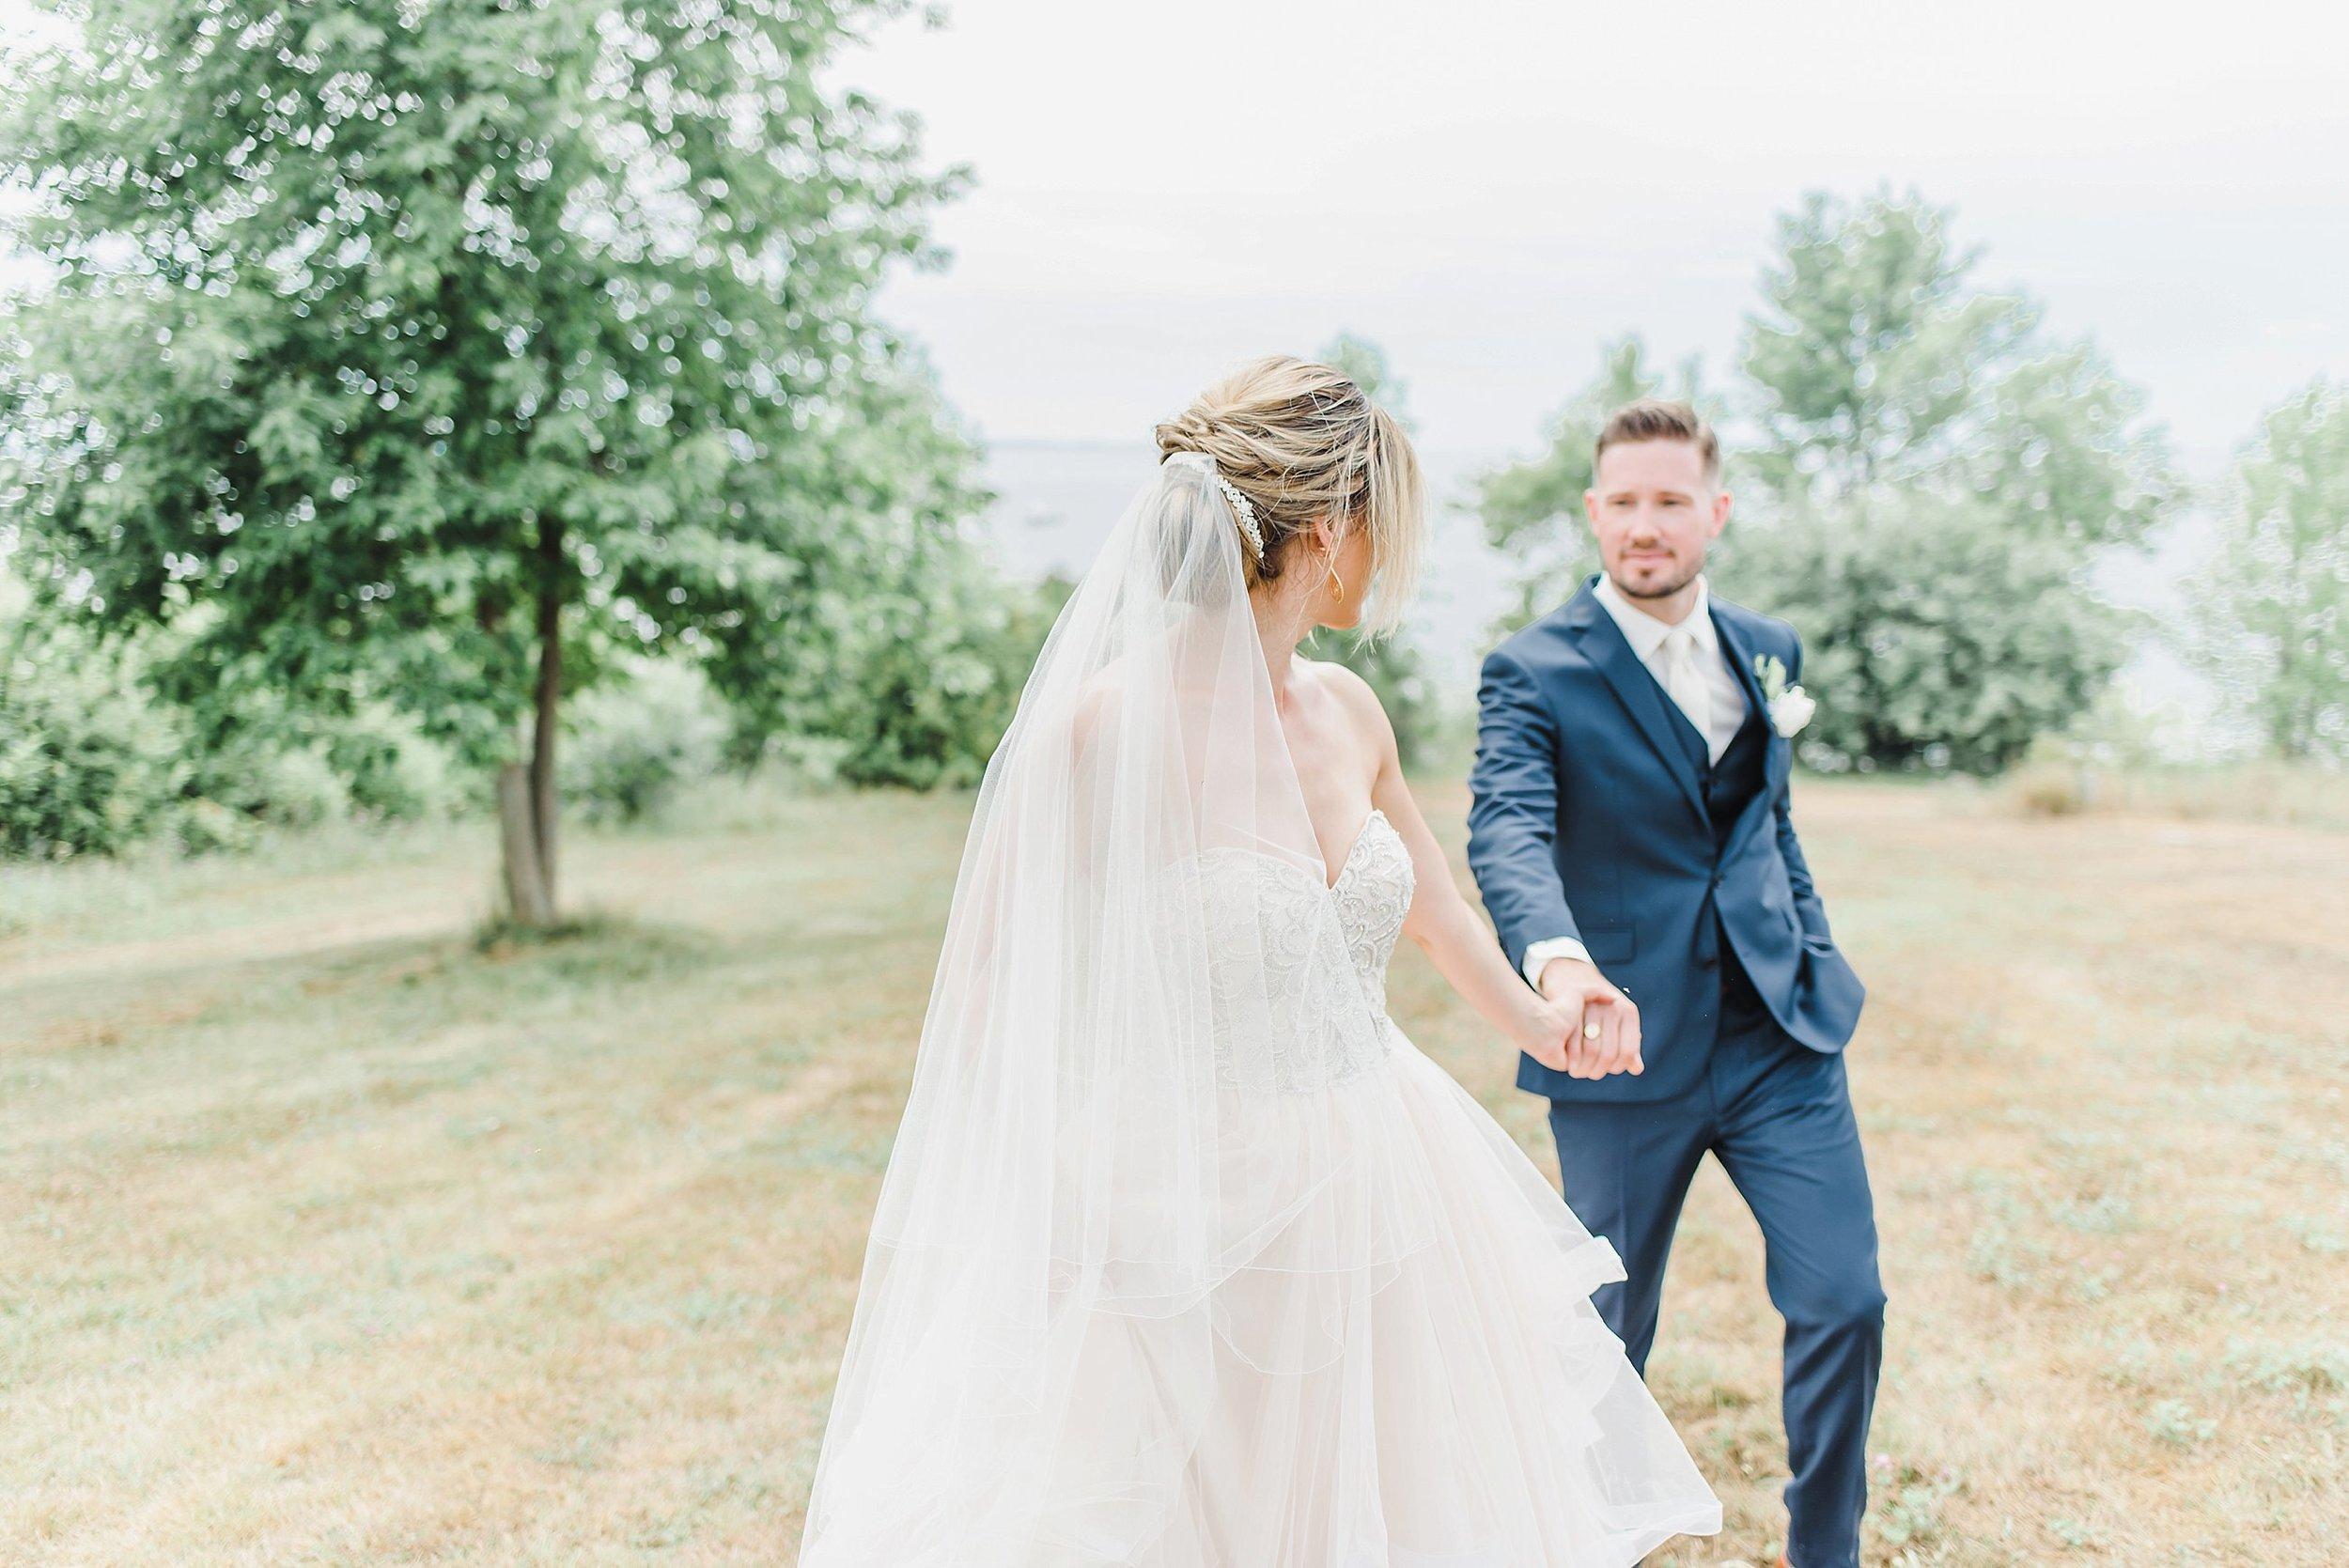 light airy indie fine art ottawa wedding photographer | Ali and Batoul Photography_0165.jpg